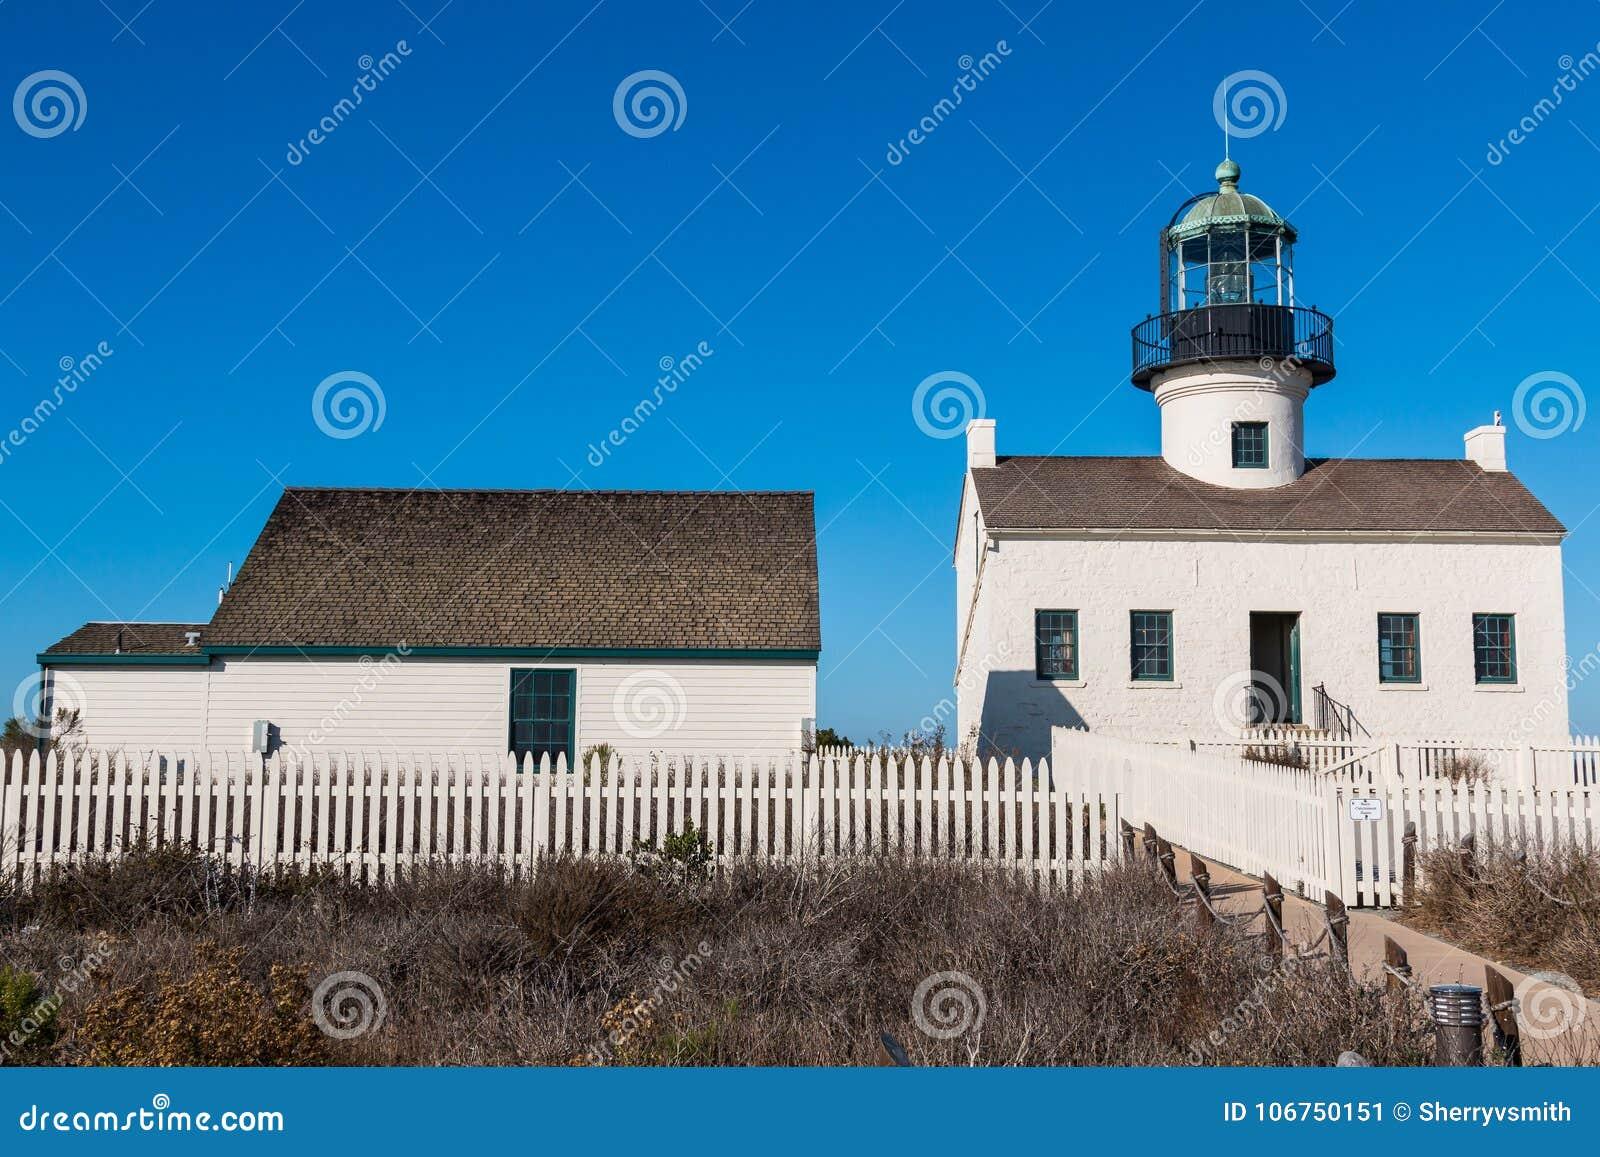 Viejo punto Loma Lighthouse y edificio adyacente